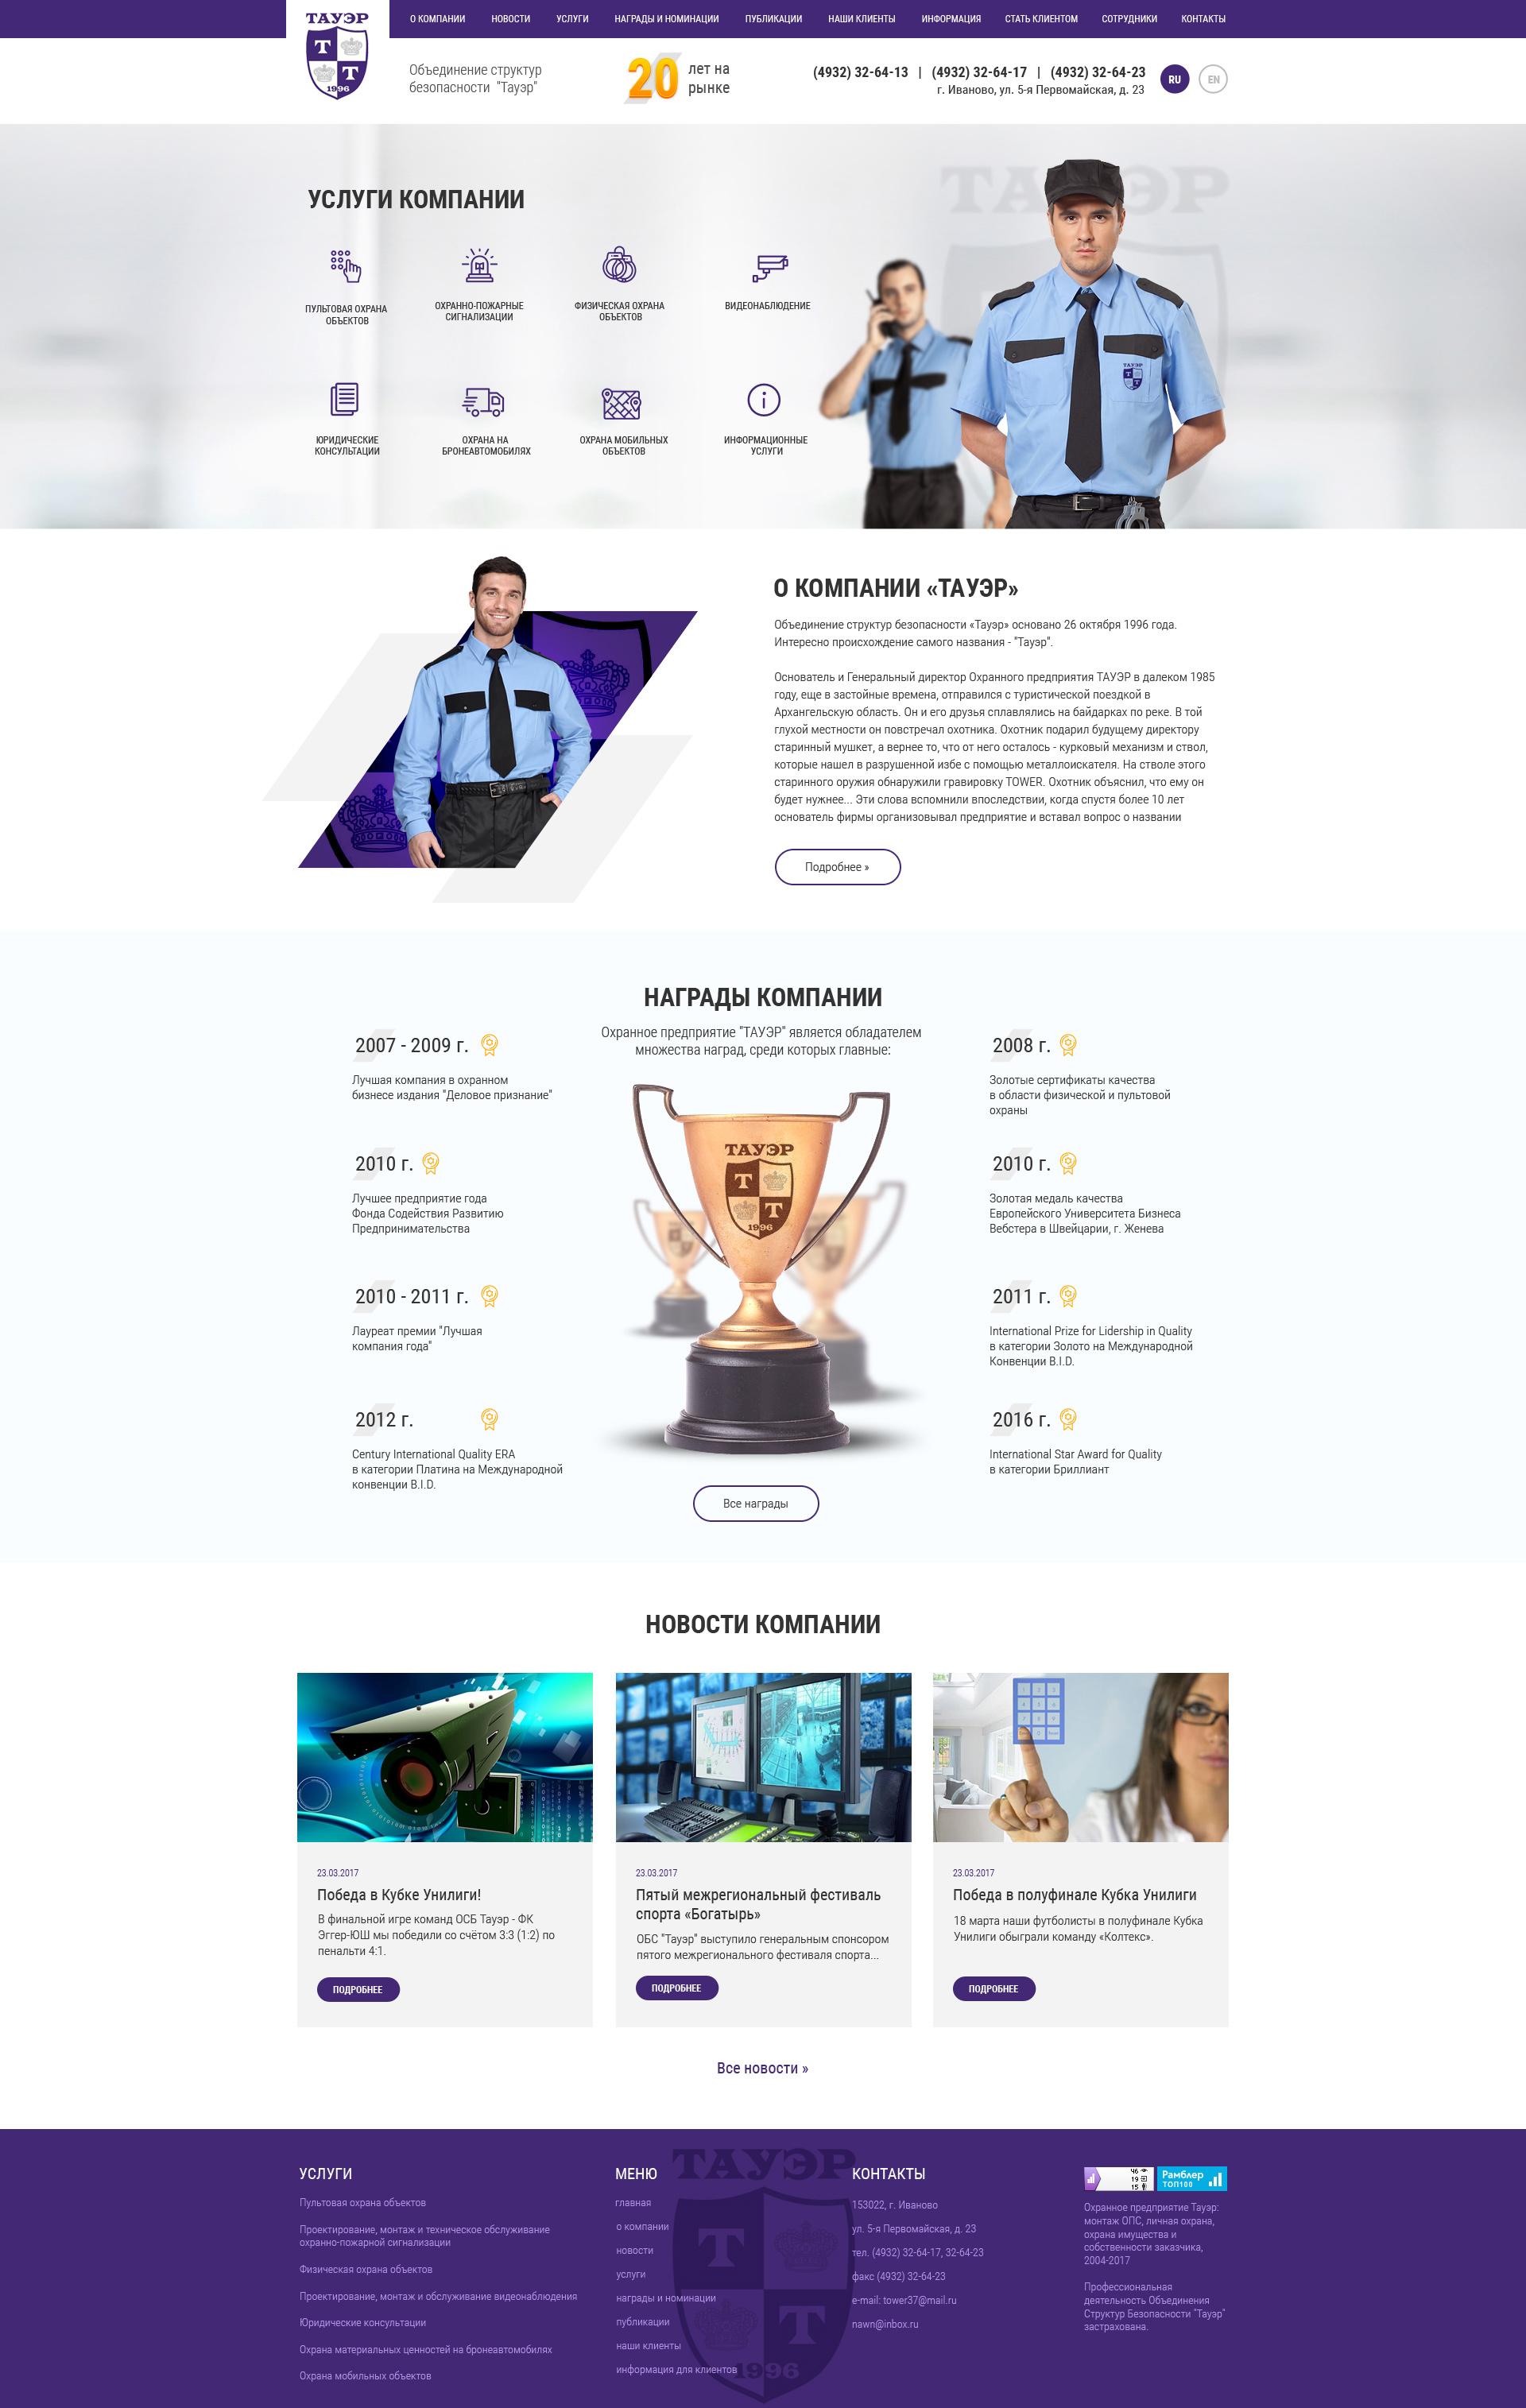 Редизайн существующего сайта компании (ЗАВЕРШЁН) фото f_08658f78b57df05b.jpg